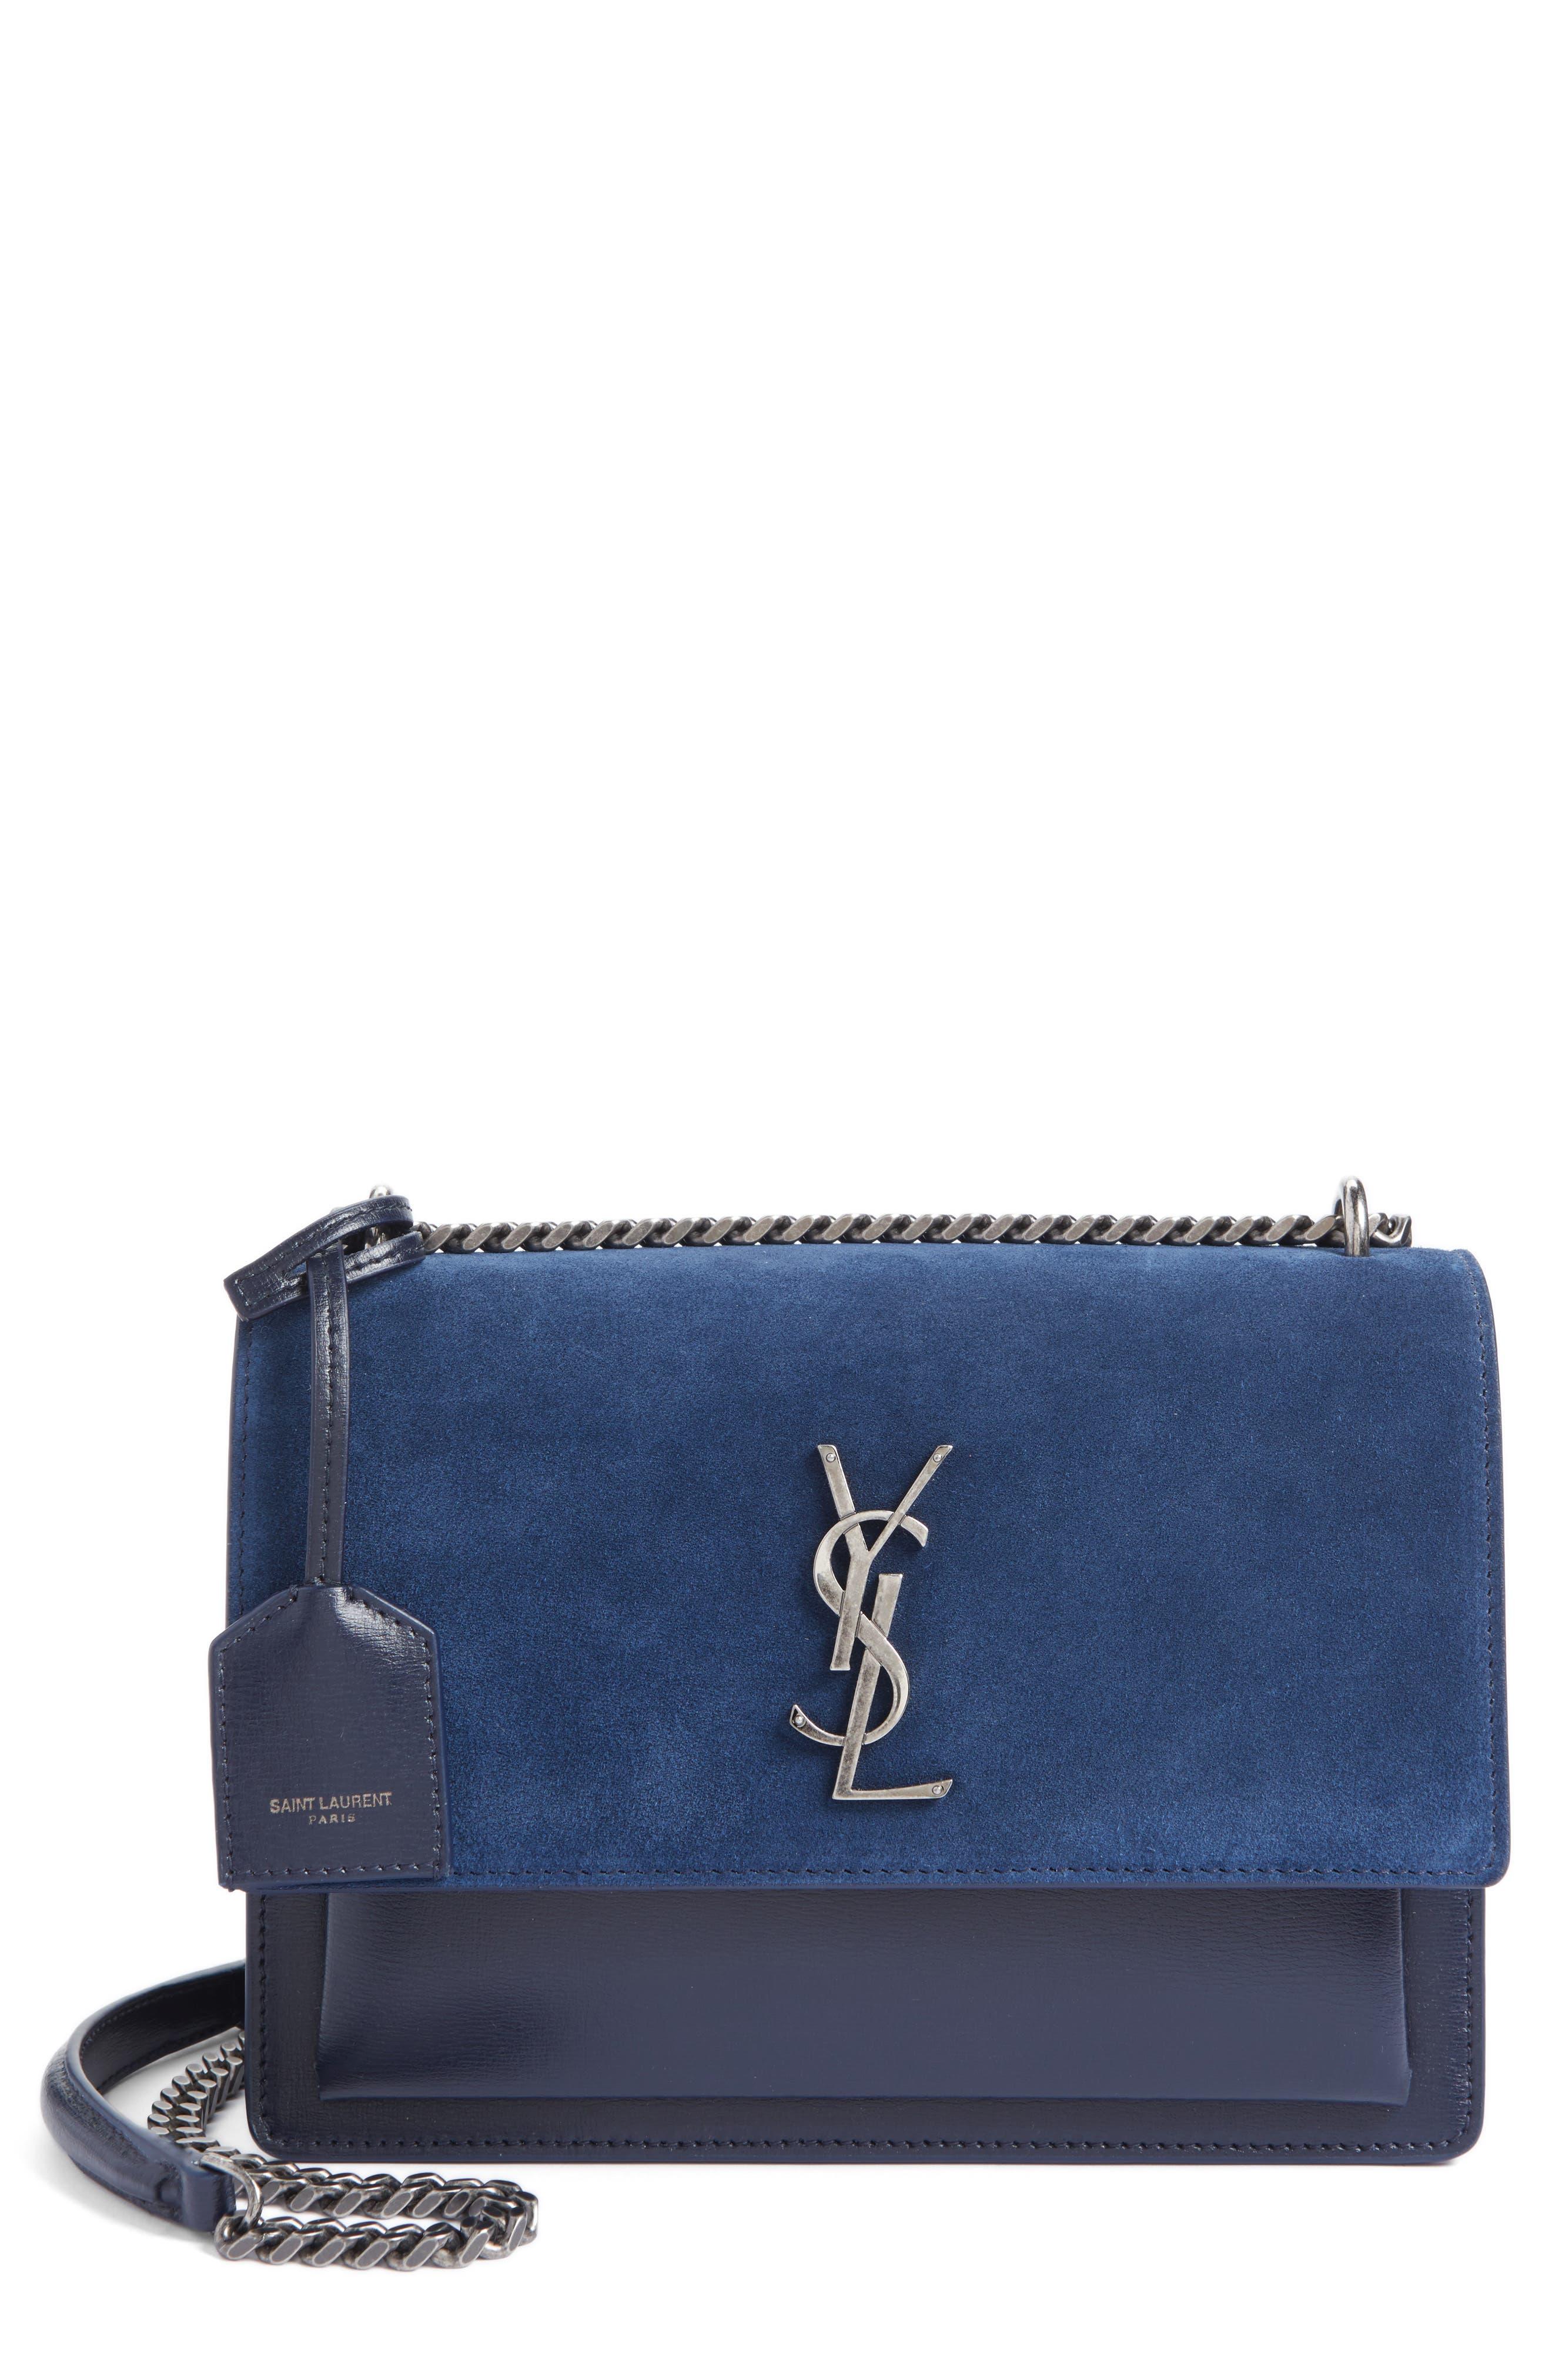 SAINT LAURENT Medium Sunset Leather & Suede Shoulder Bag